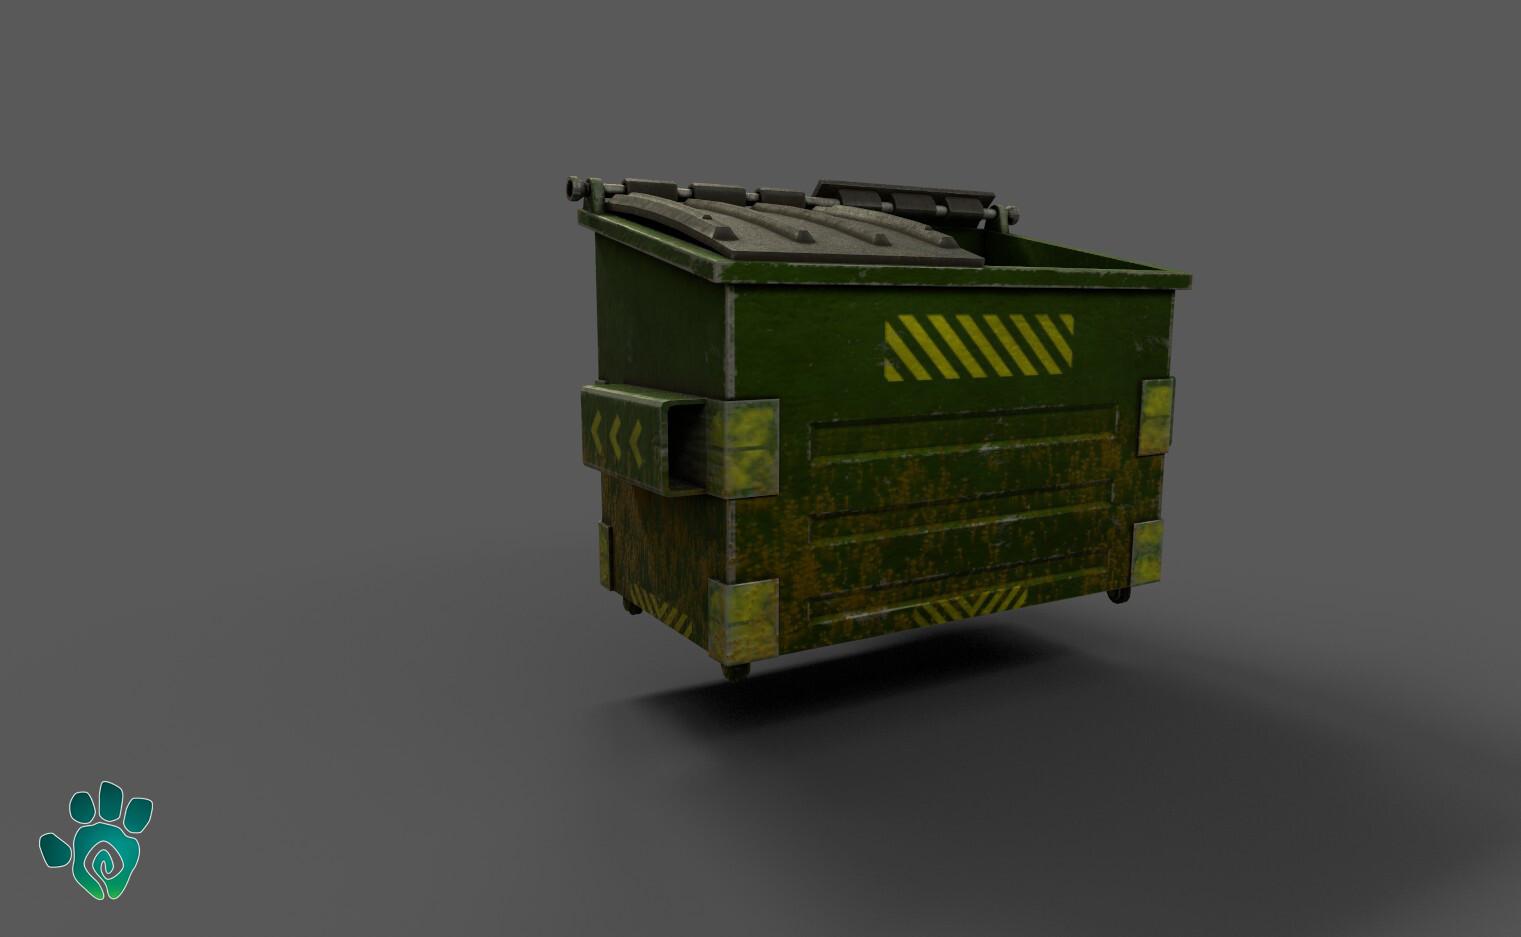 Zach cordisco dumpster 3